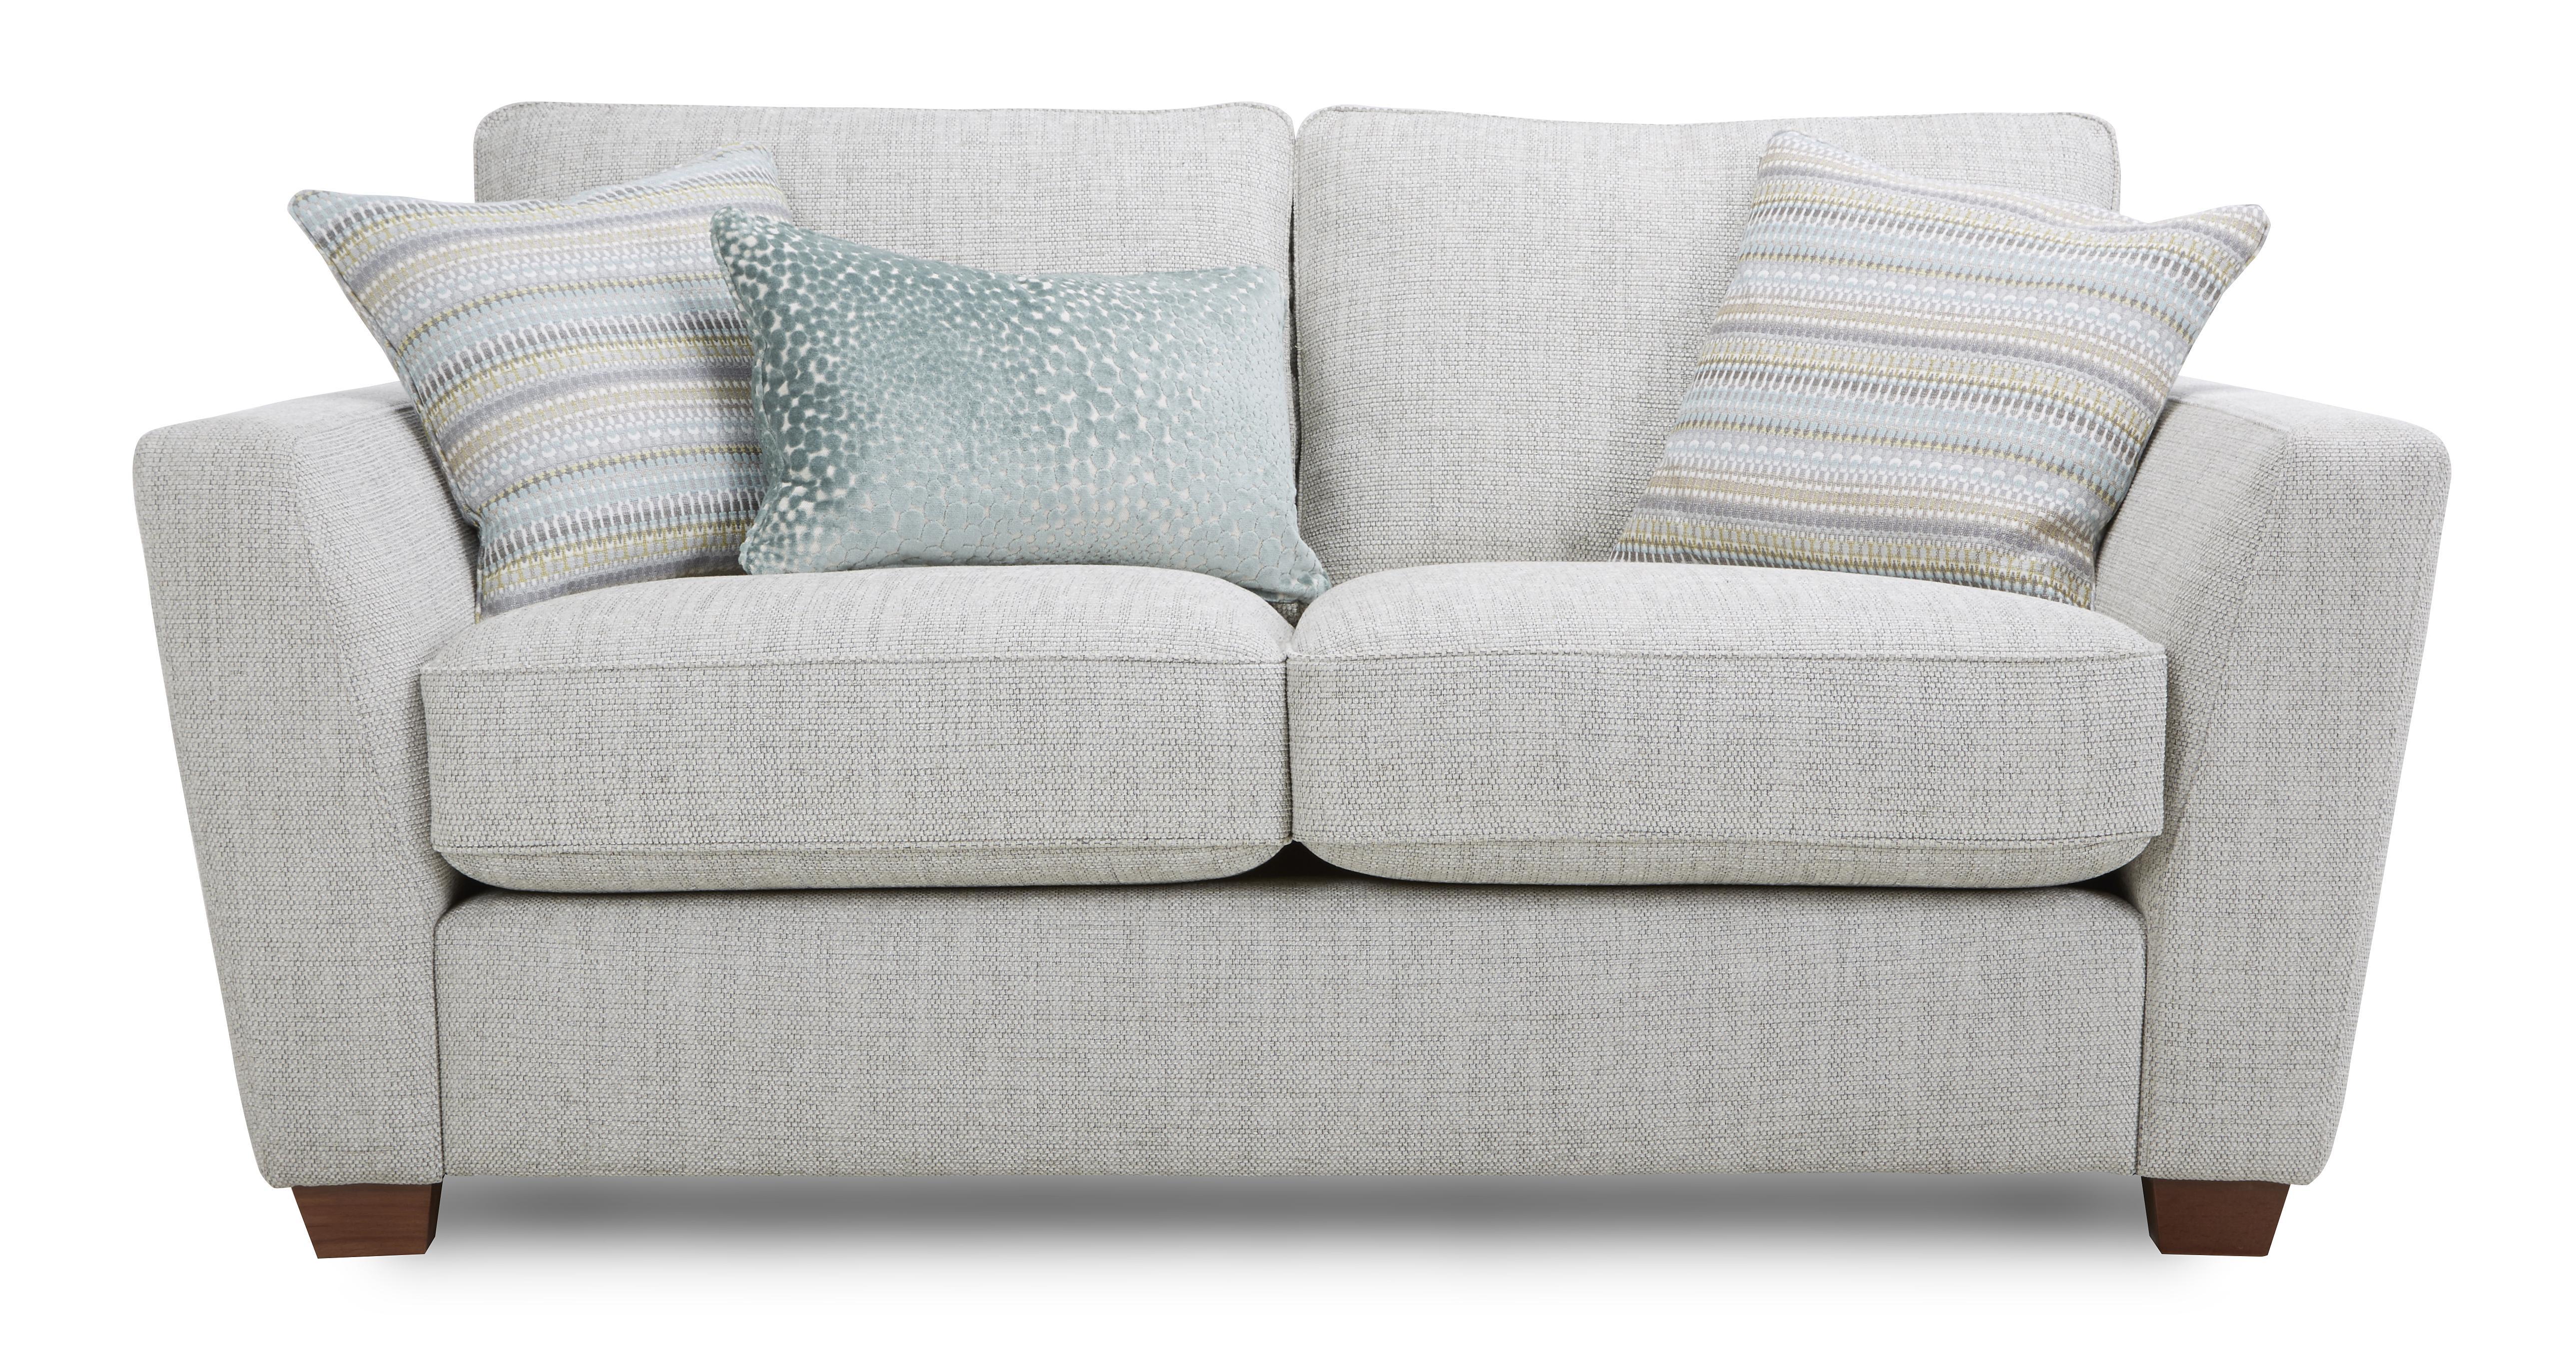 Swell Sophia 2 Seater Sofa Uwap Interior Chair Design Uwaporg